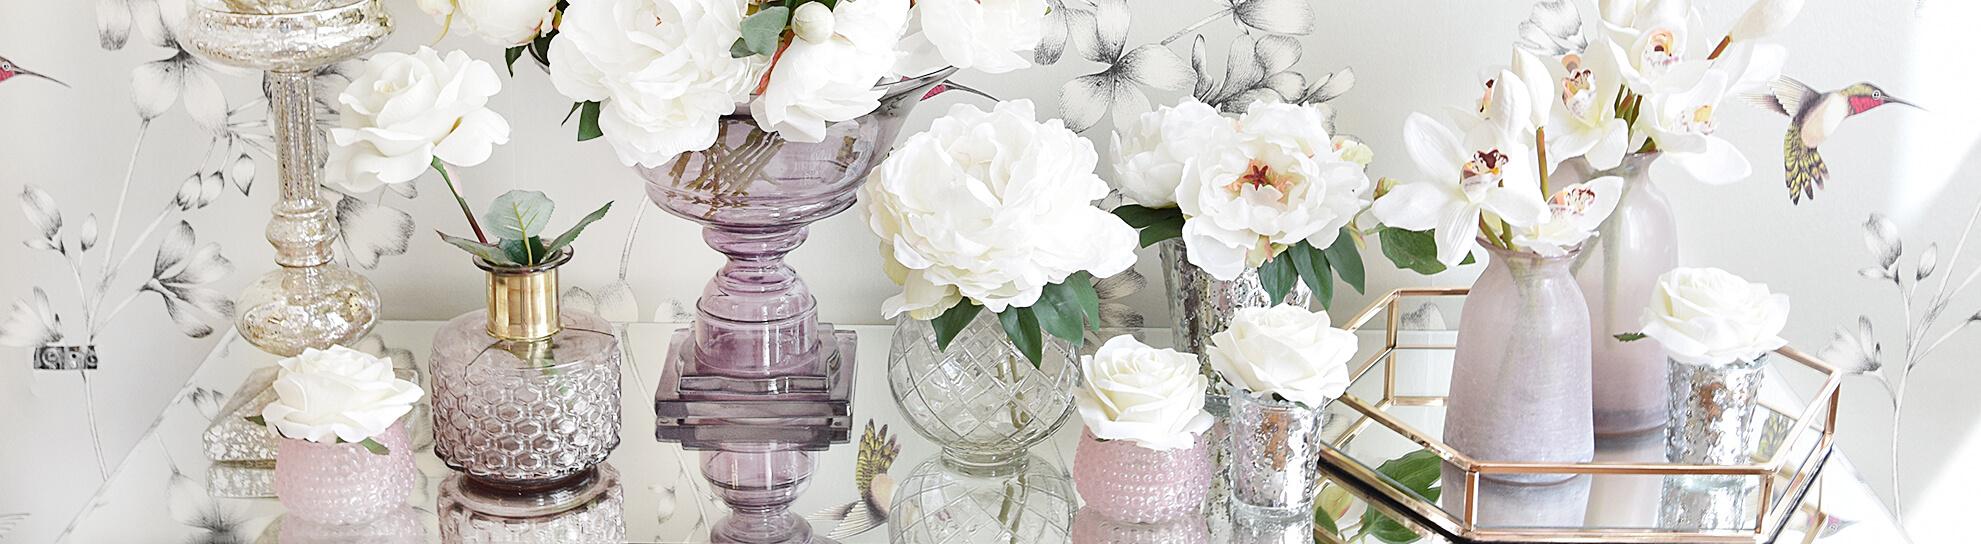 Töpfe & Vasen